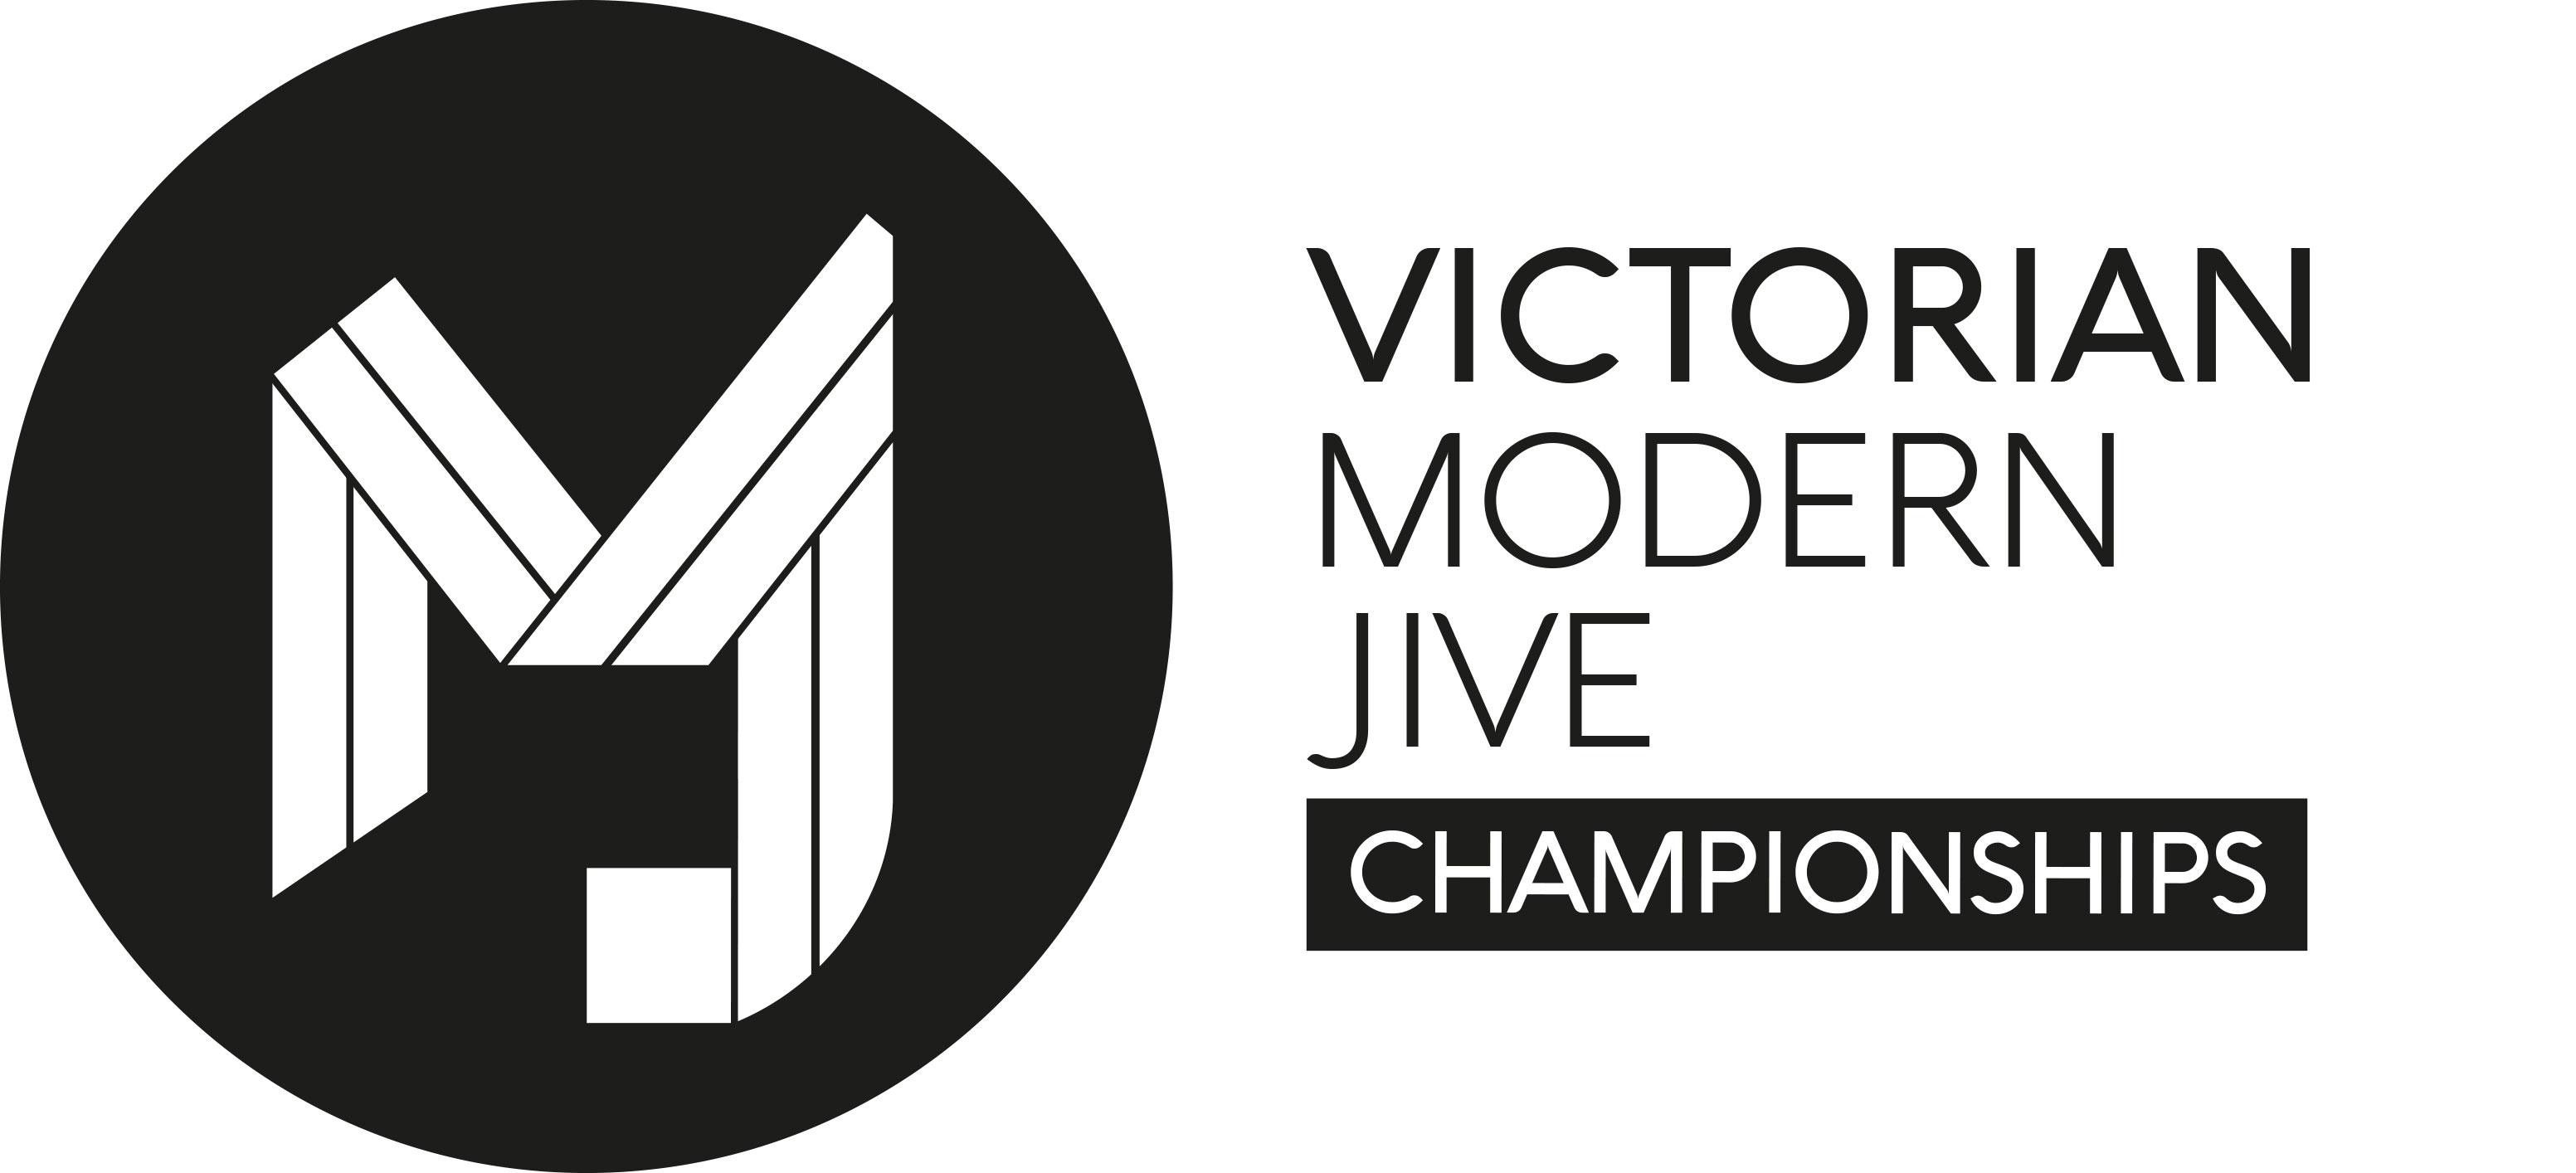 Victorian Modern Jive Championships